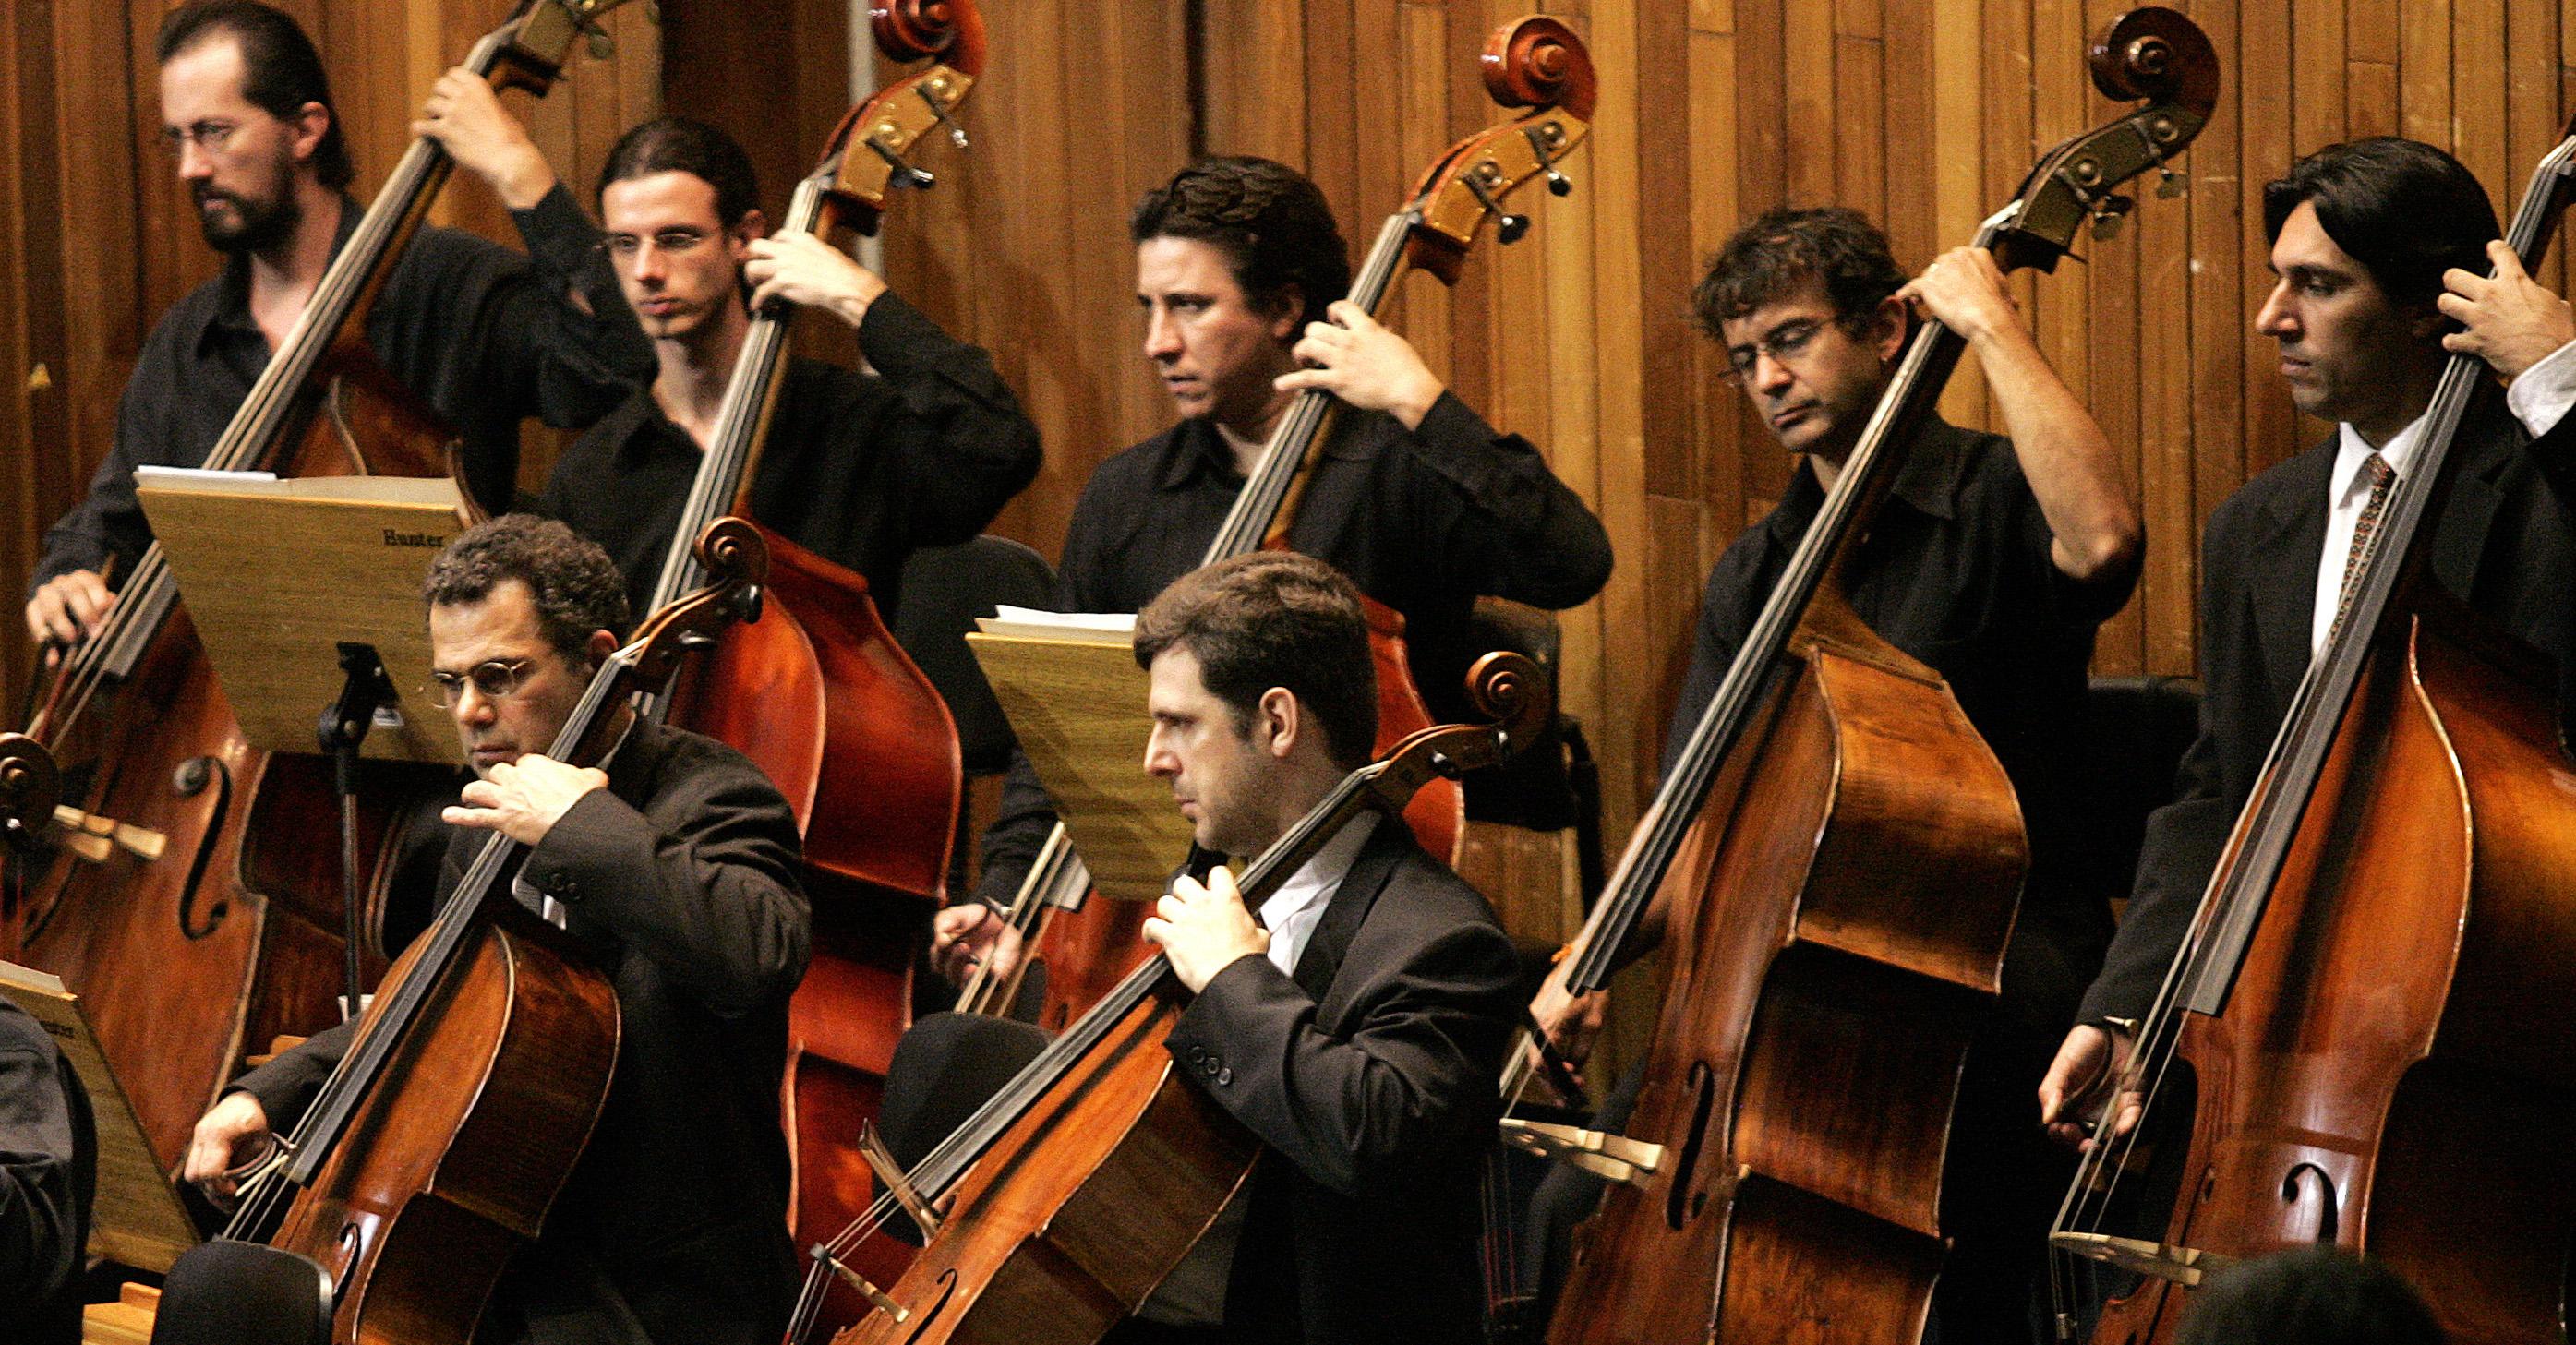 Apresentacao orquestra sinfonica sp